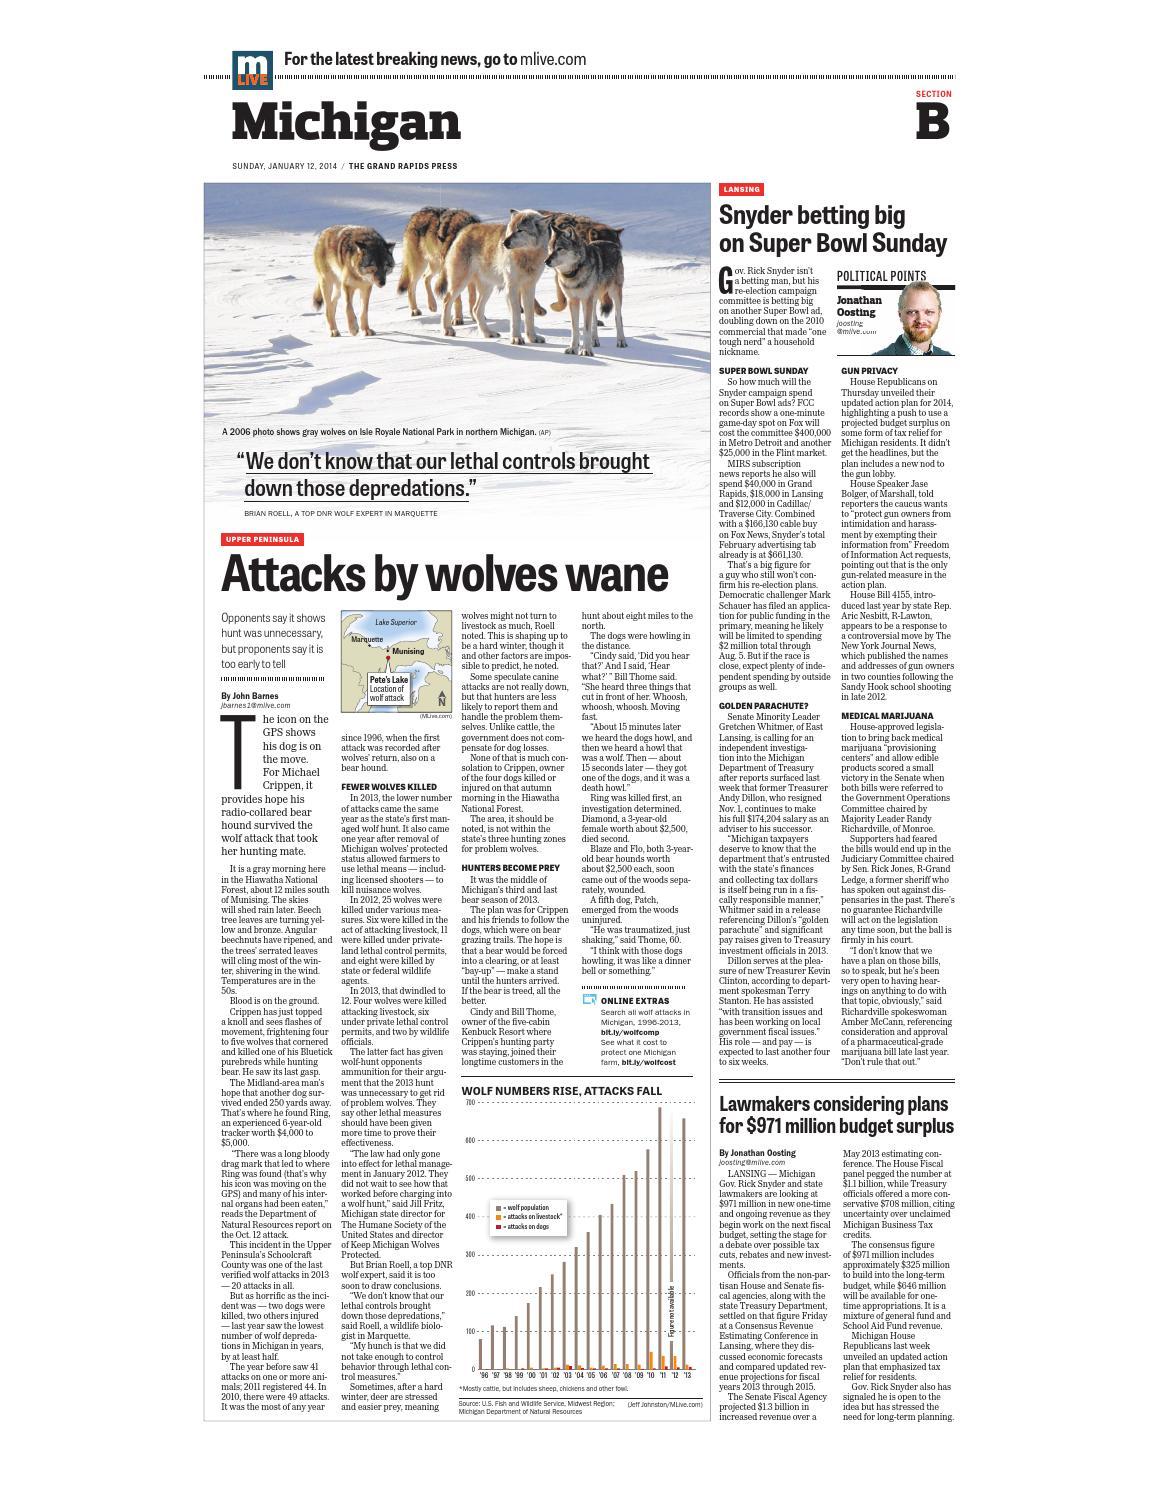 Grand Rapids Press - Jan  12, 2014 - Section B by Grand